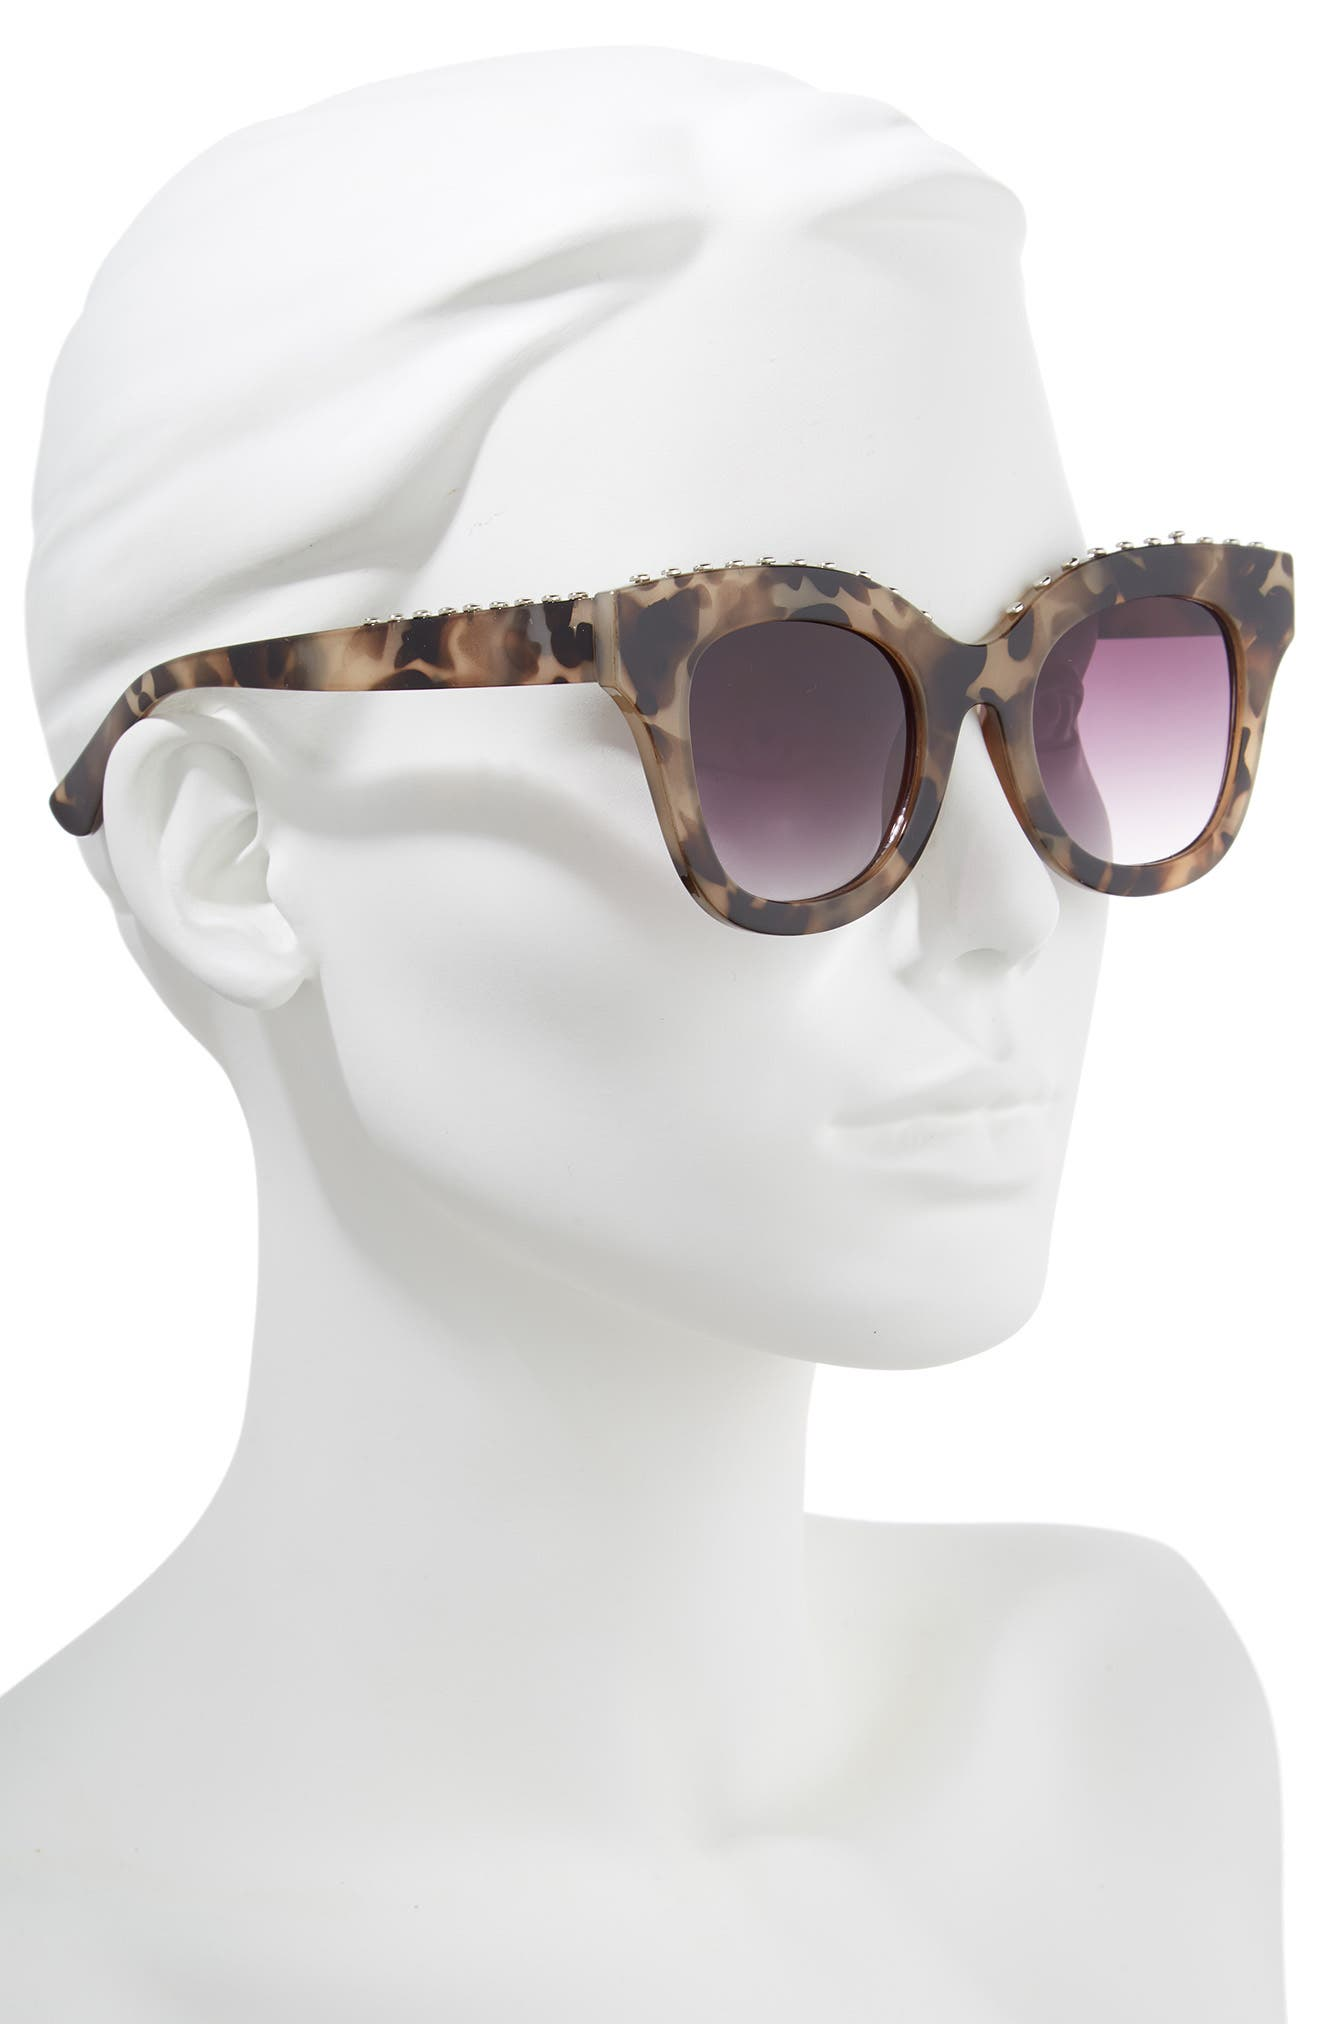 48mm Studded Sunglasses,                             Alternate thumbnail 2, color,                             Tort/ Silver